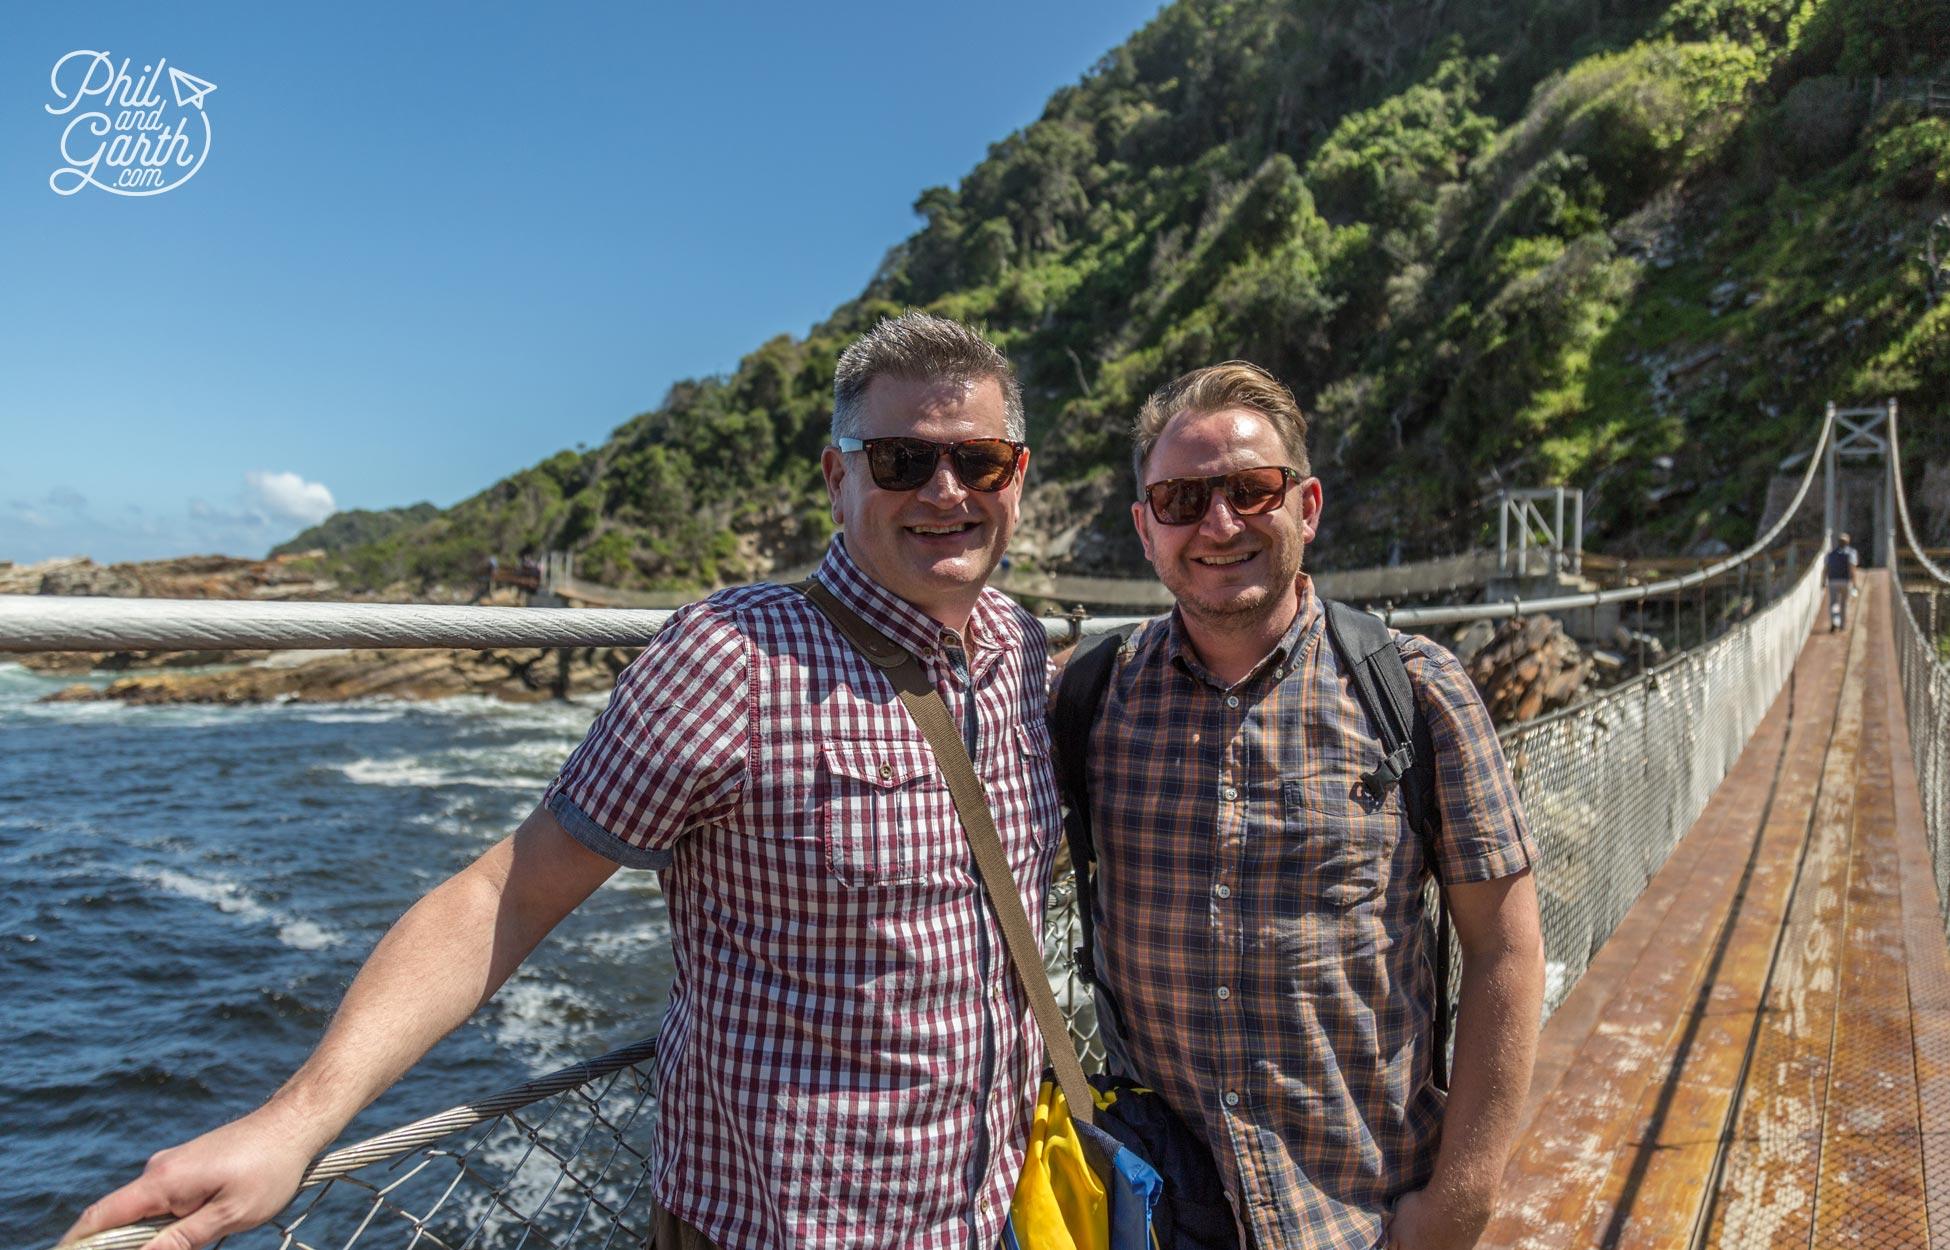 Phil and Garth on a suspension bridge at Tsitsikamma